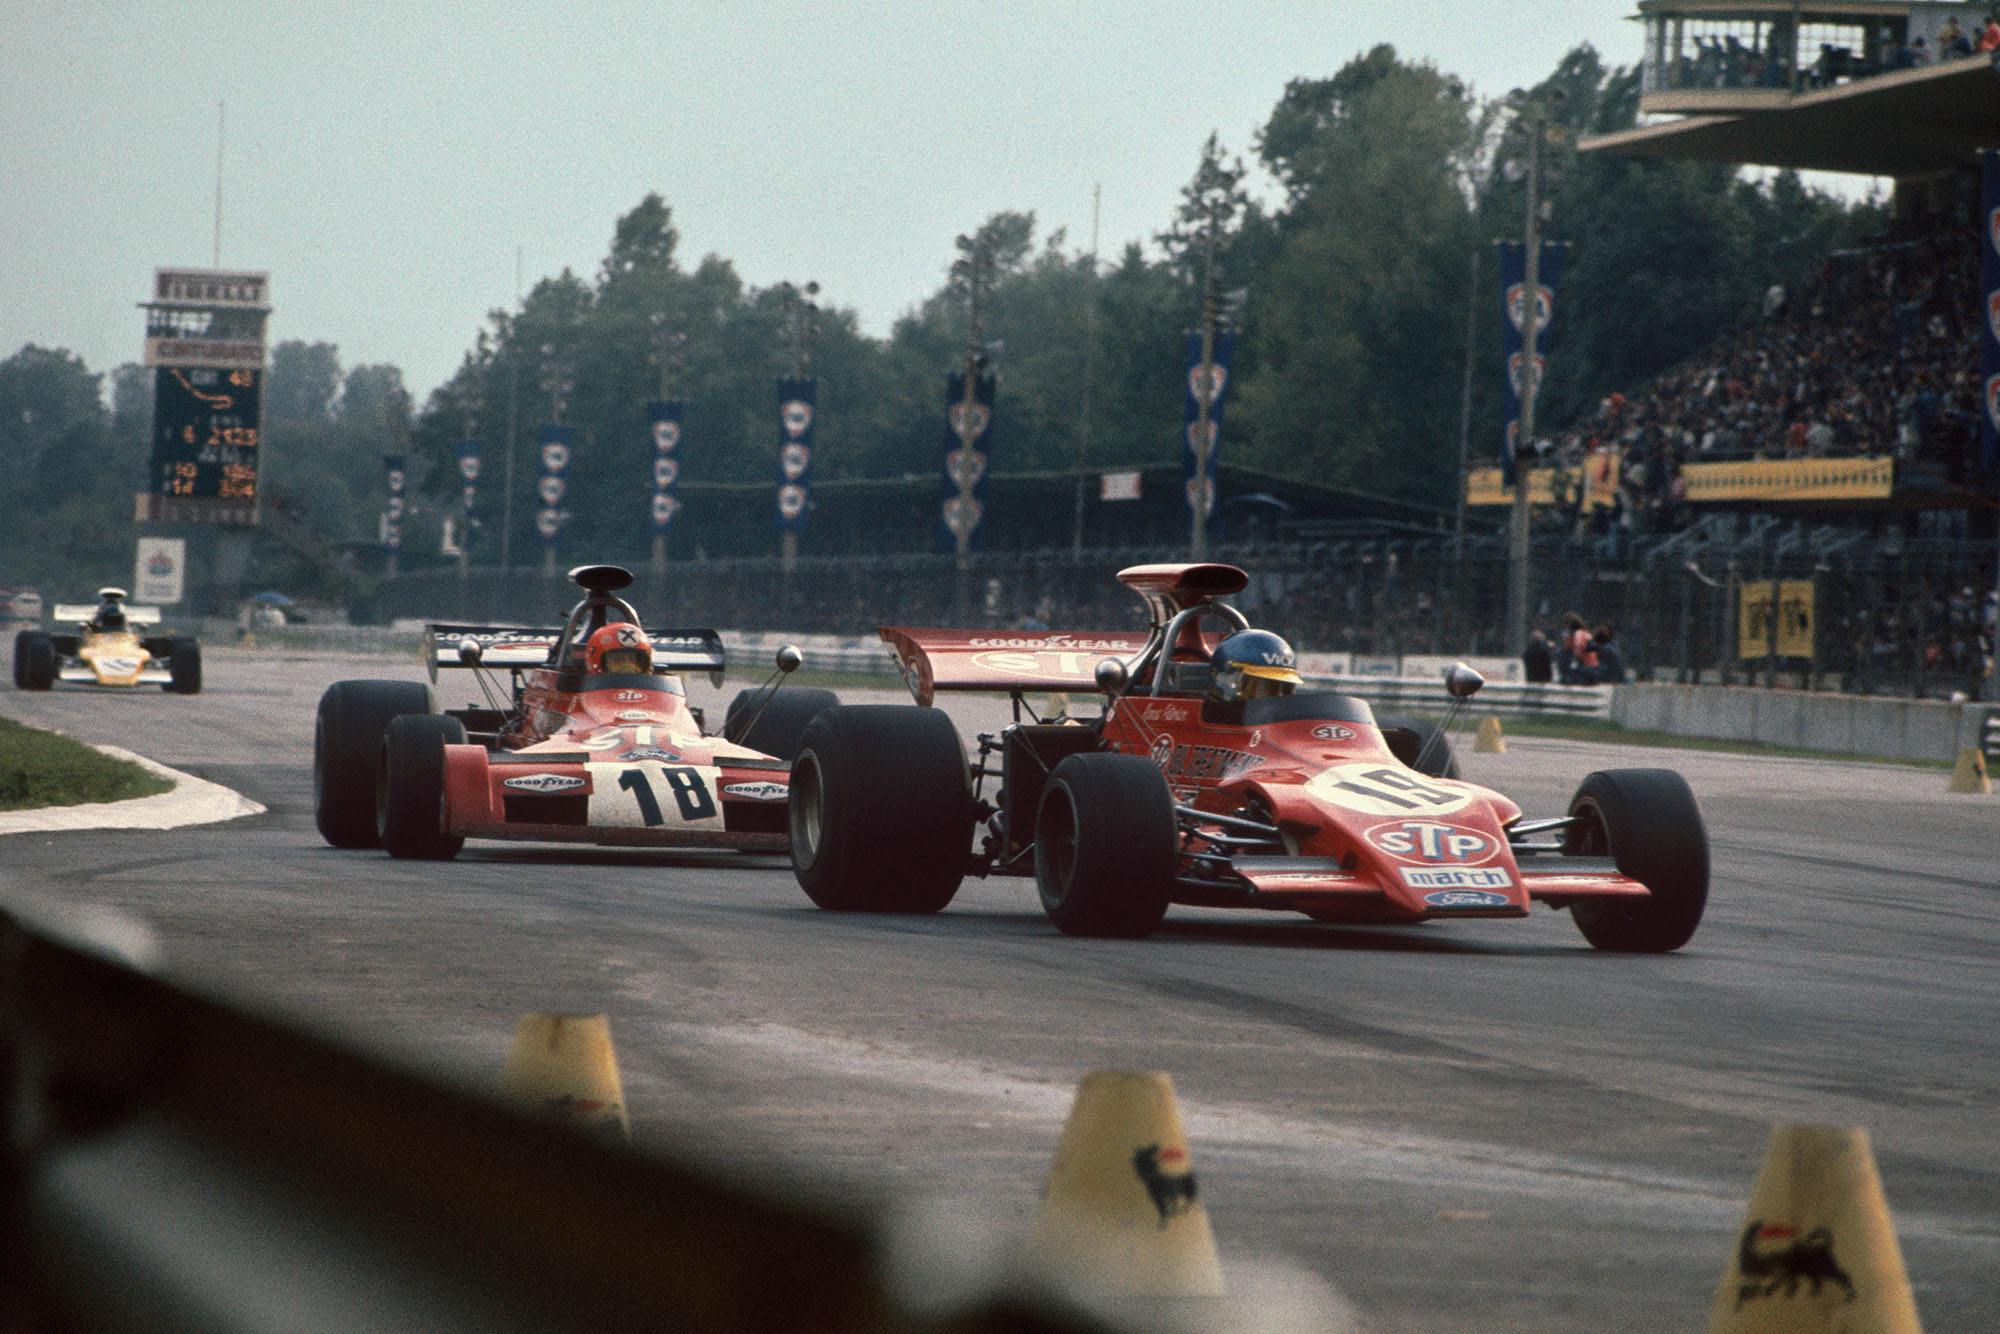 Ronnie Peterson (March) leads Niki Lauda (March) at the 1972 Italian Grand Prix, Monza.